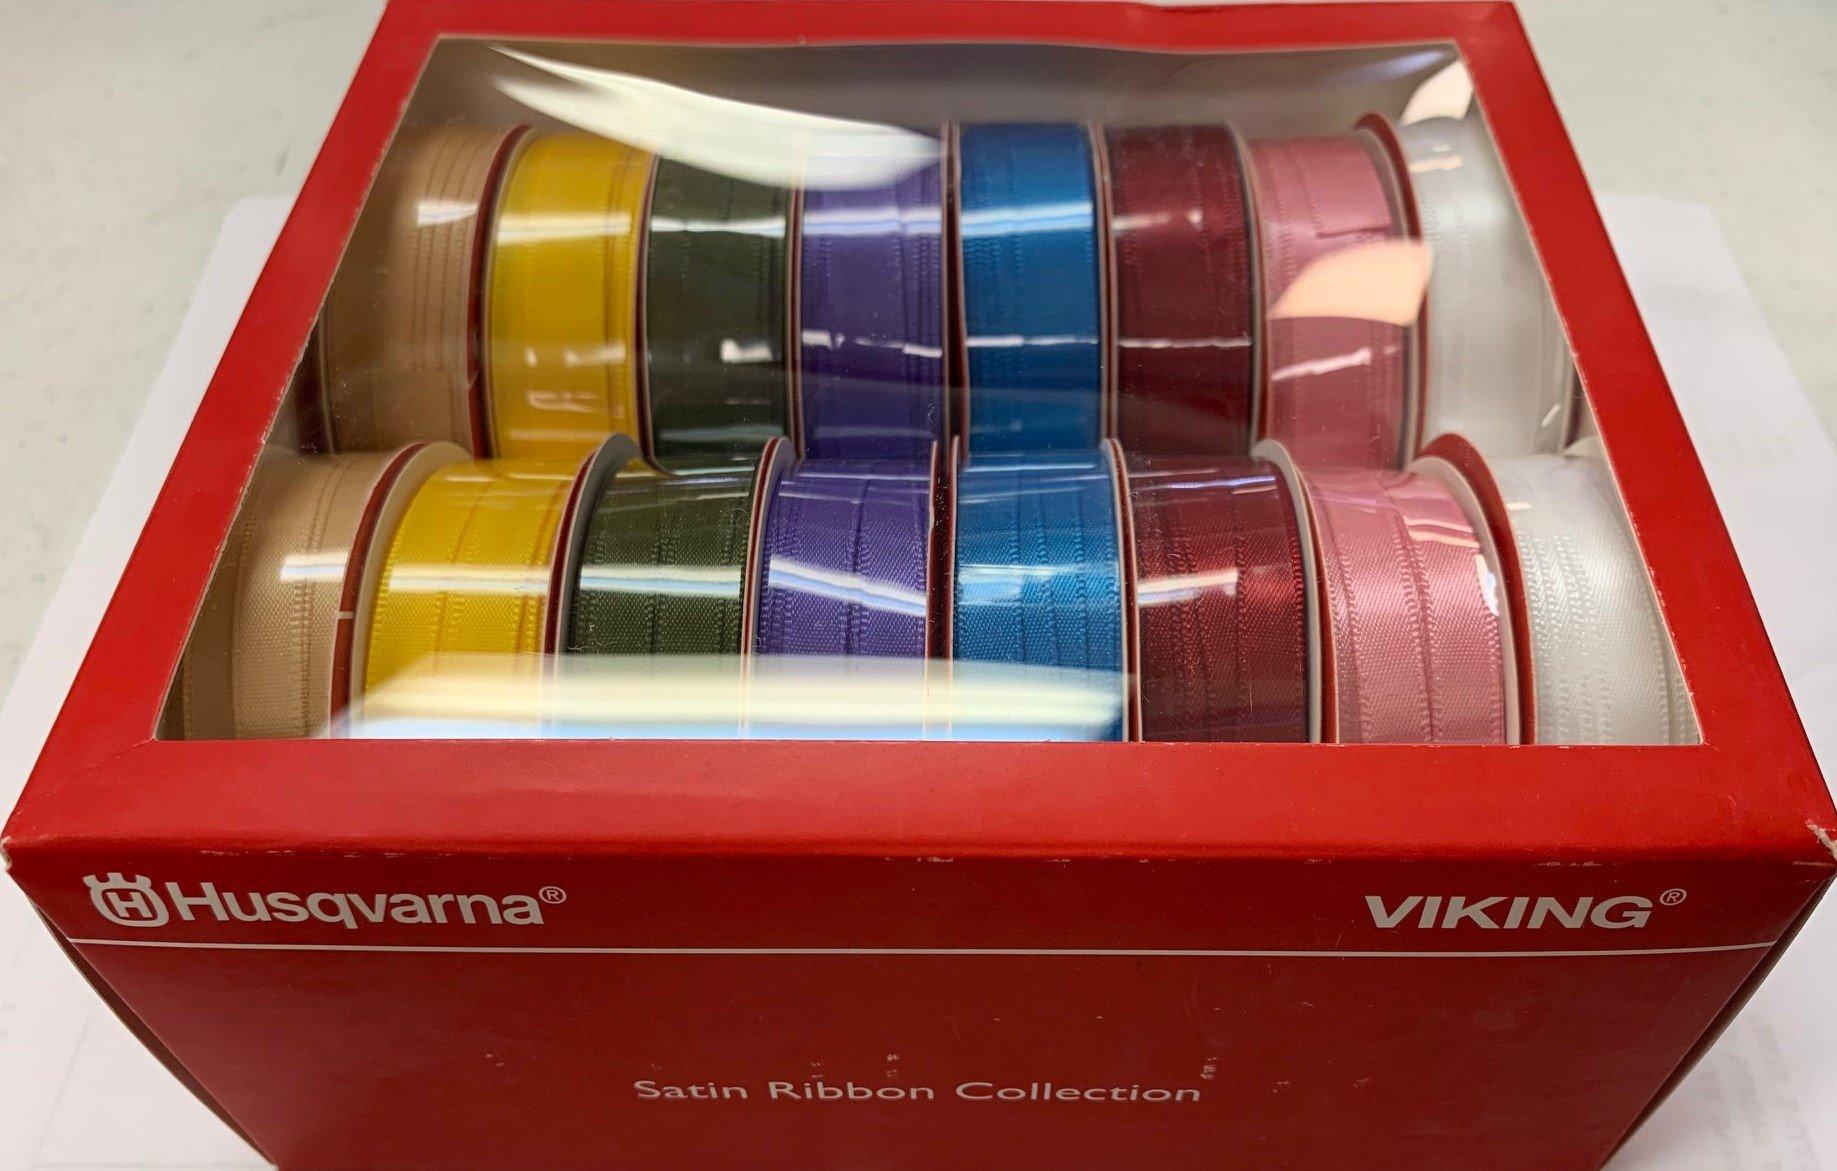 Satin Ribbon Collection